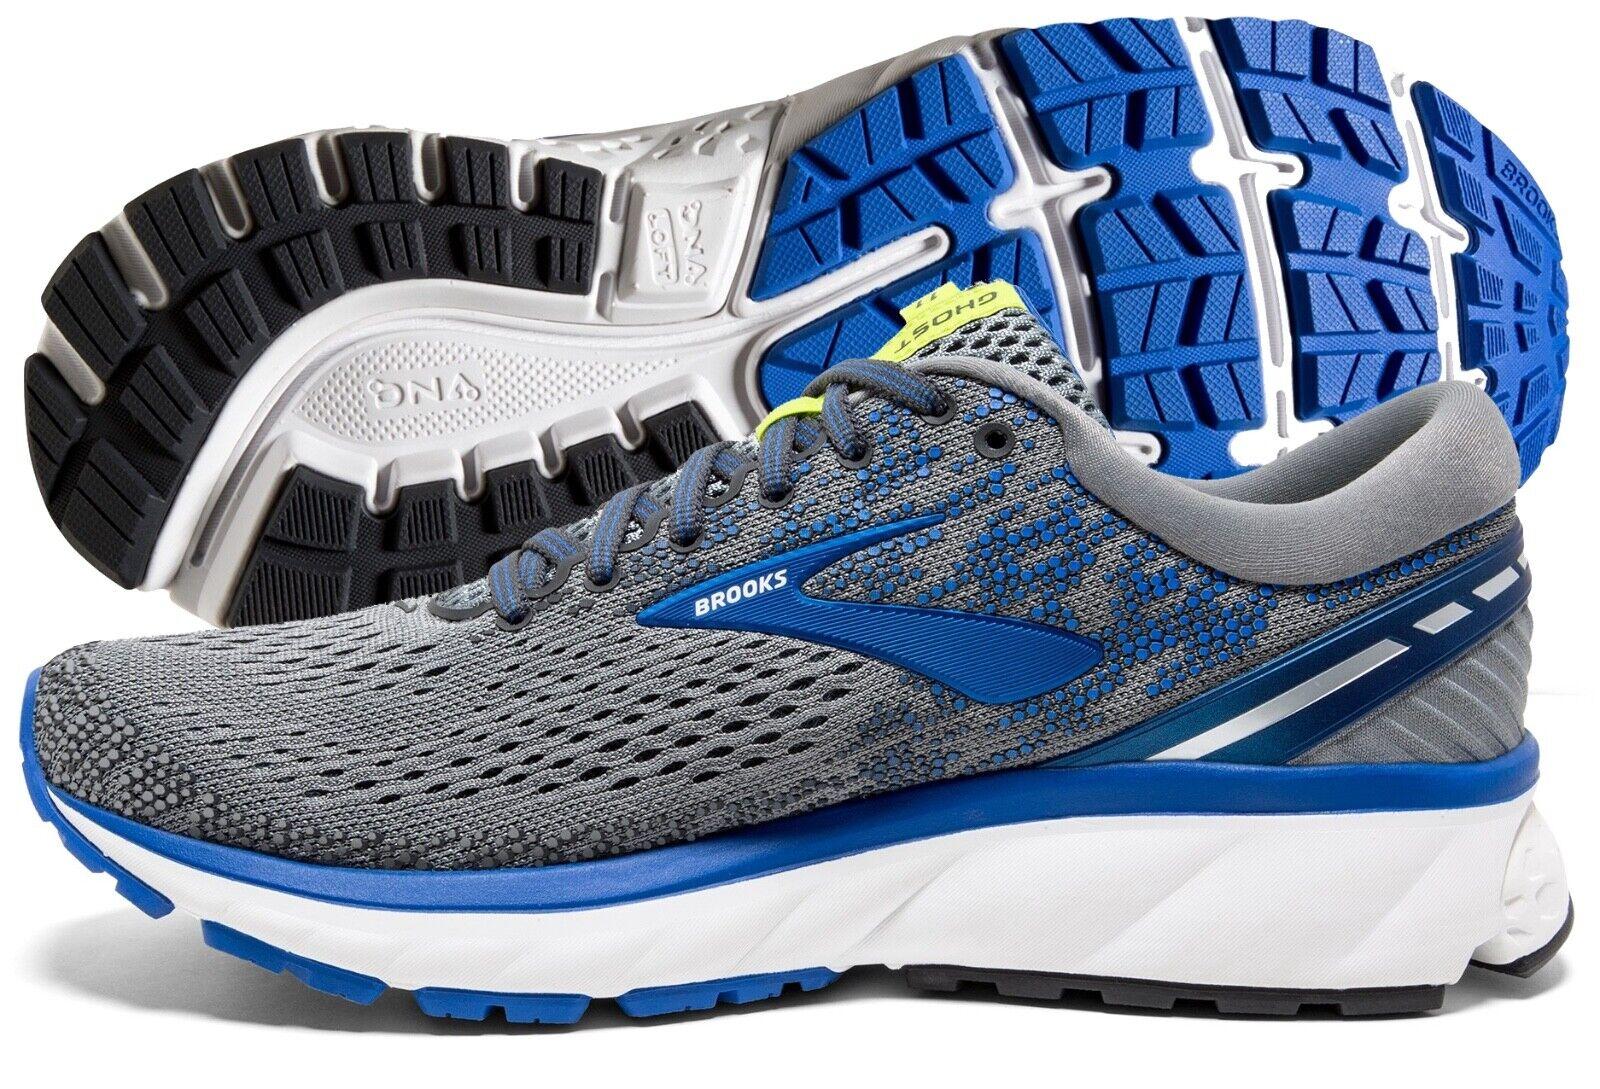 Brooks Ghost 11 Mens Running Shoe Grey/Blue/Silver multiple